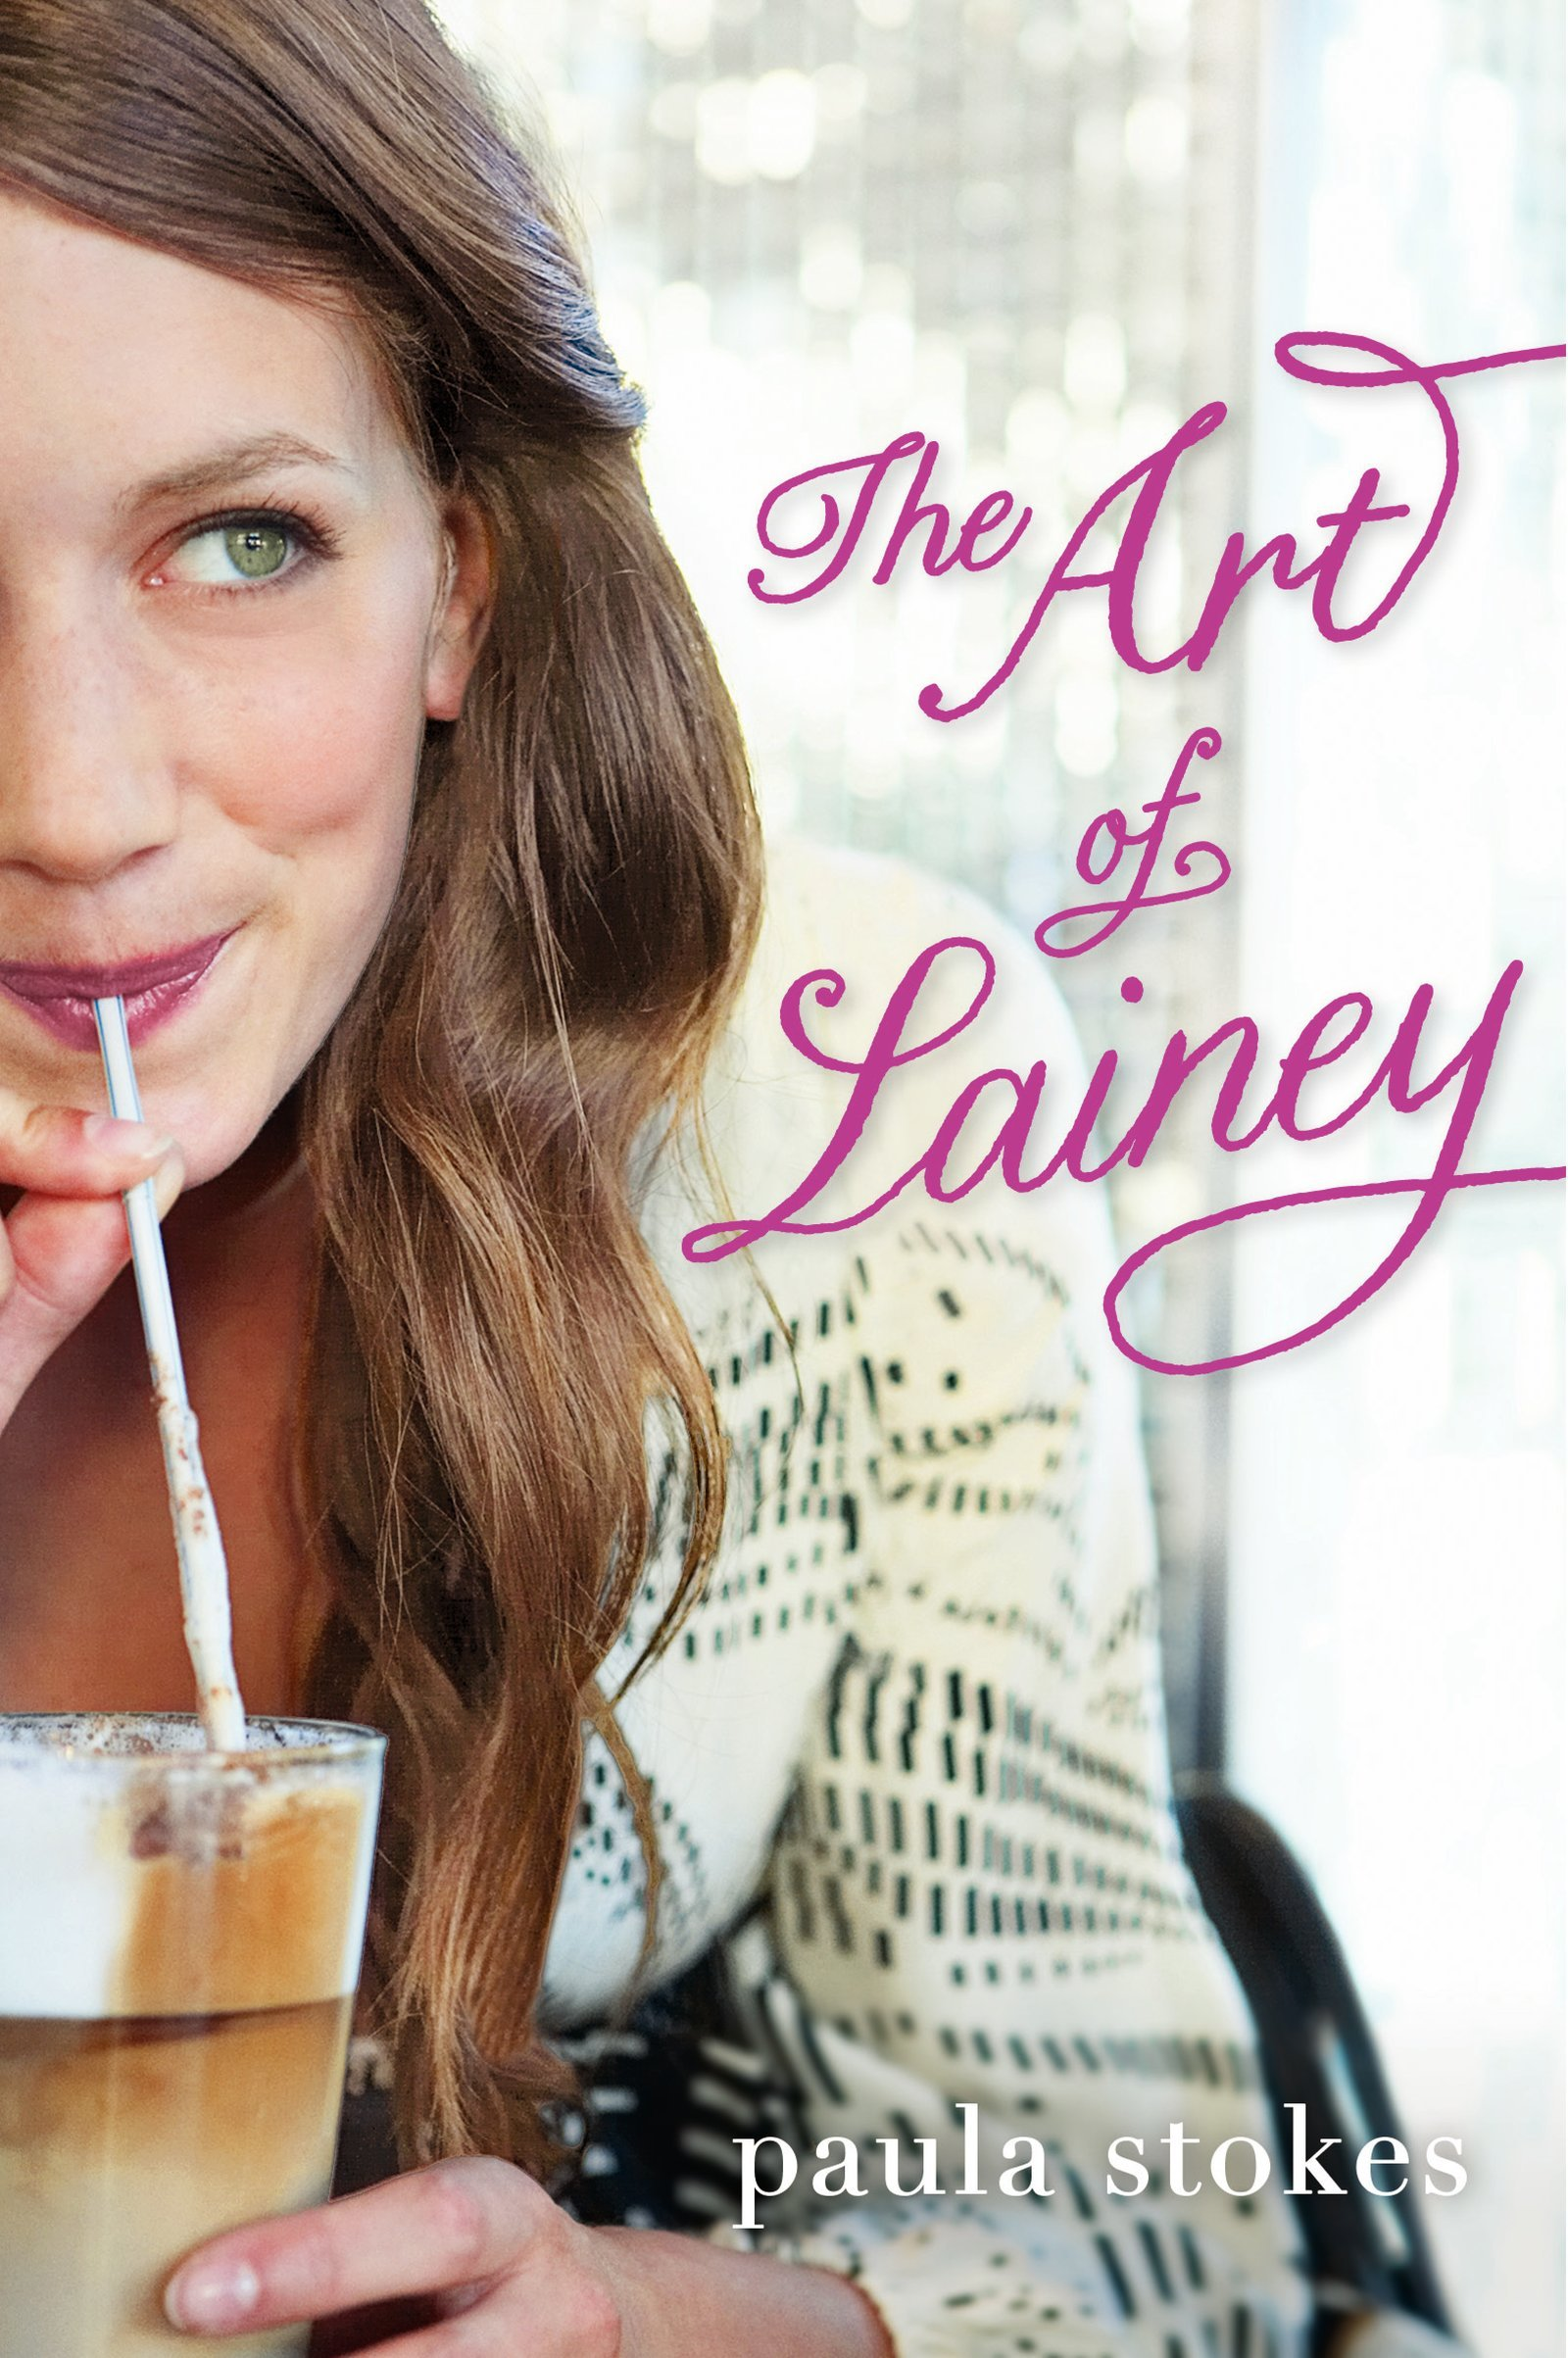 The Art of Lainey by Paula Stokes | Clear Eyes, Full Shelves